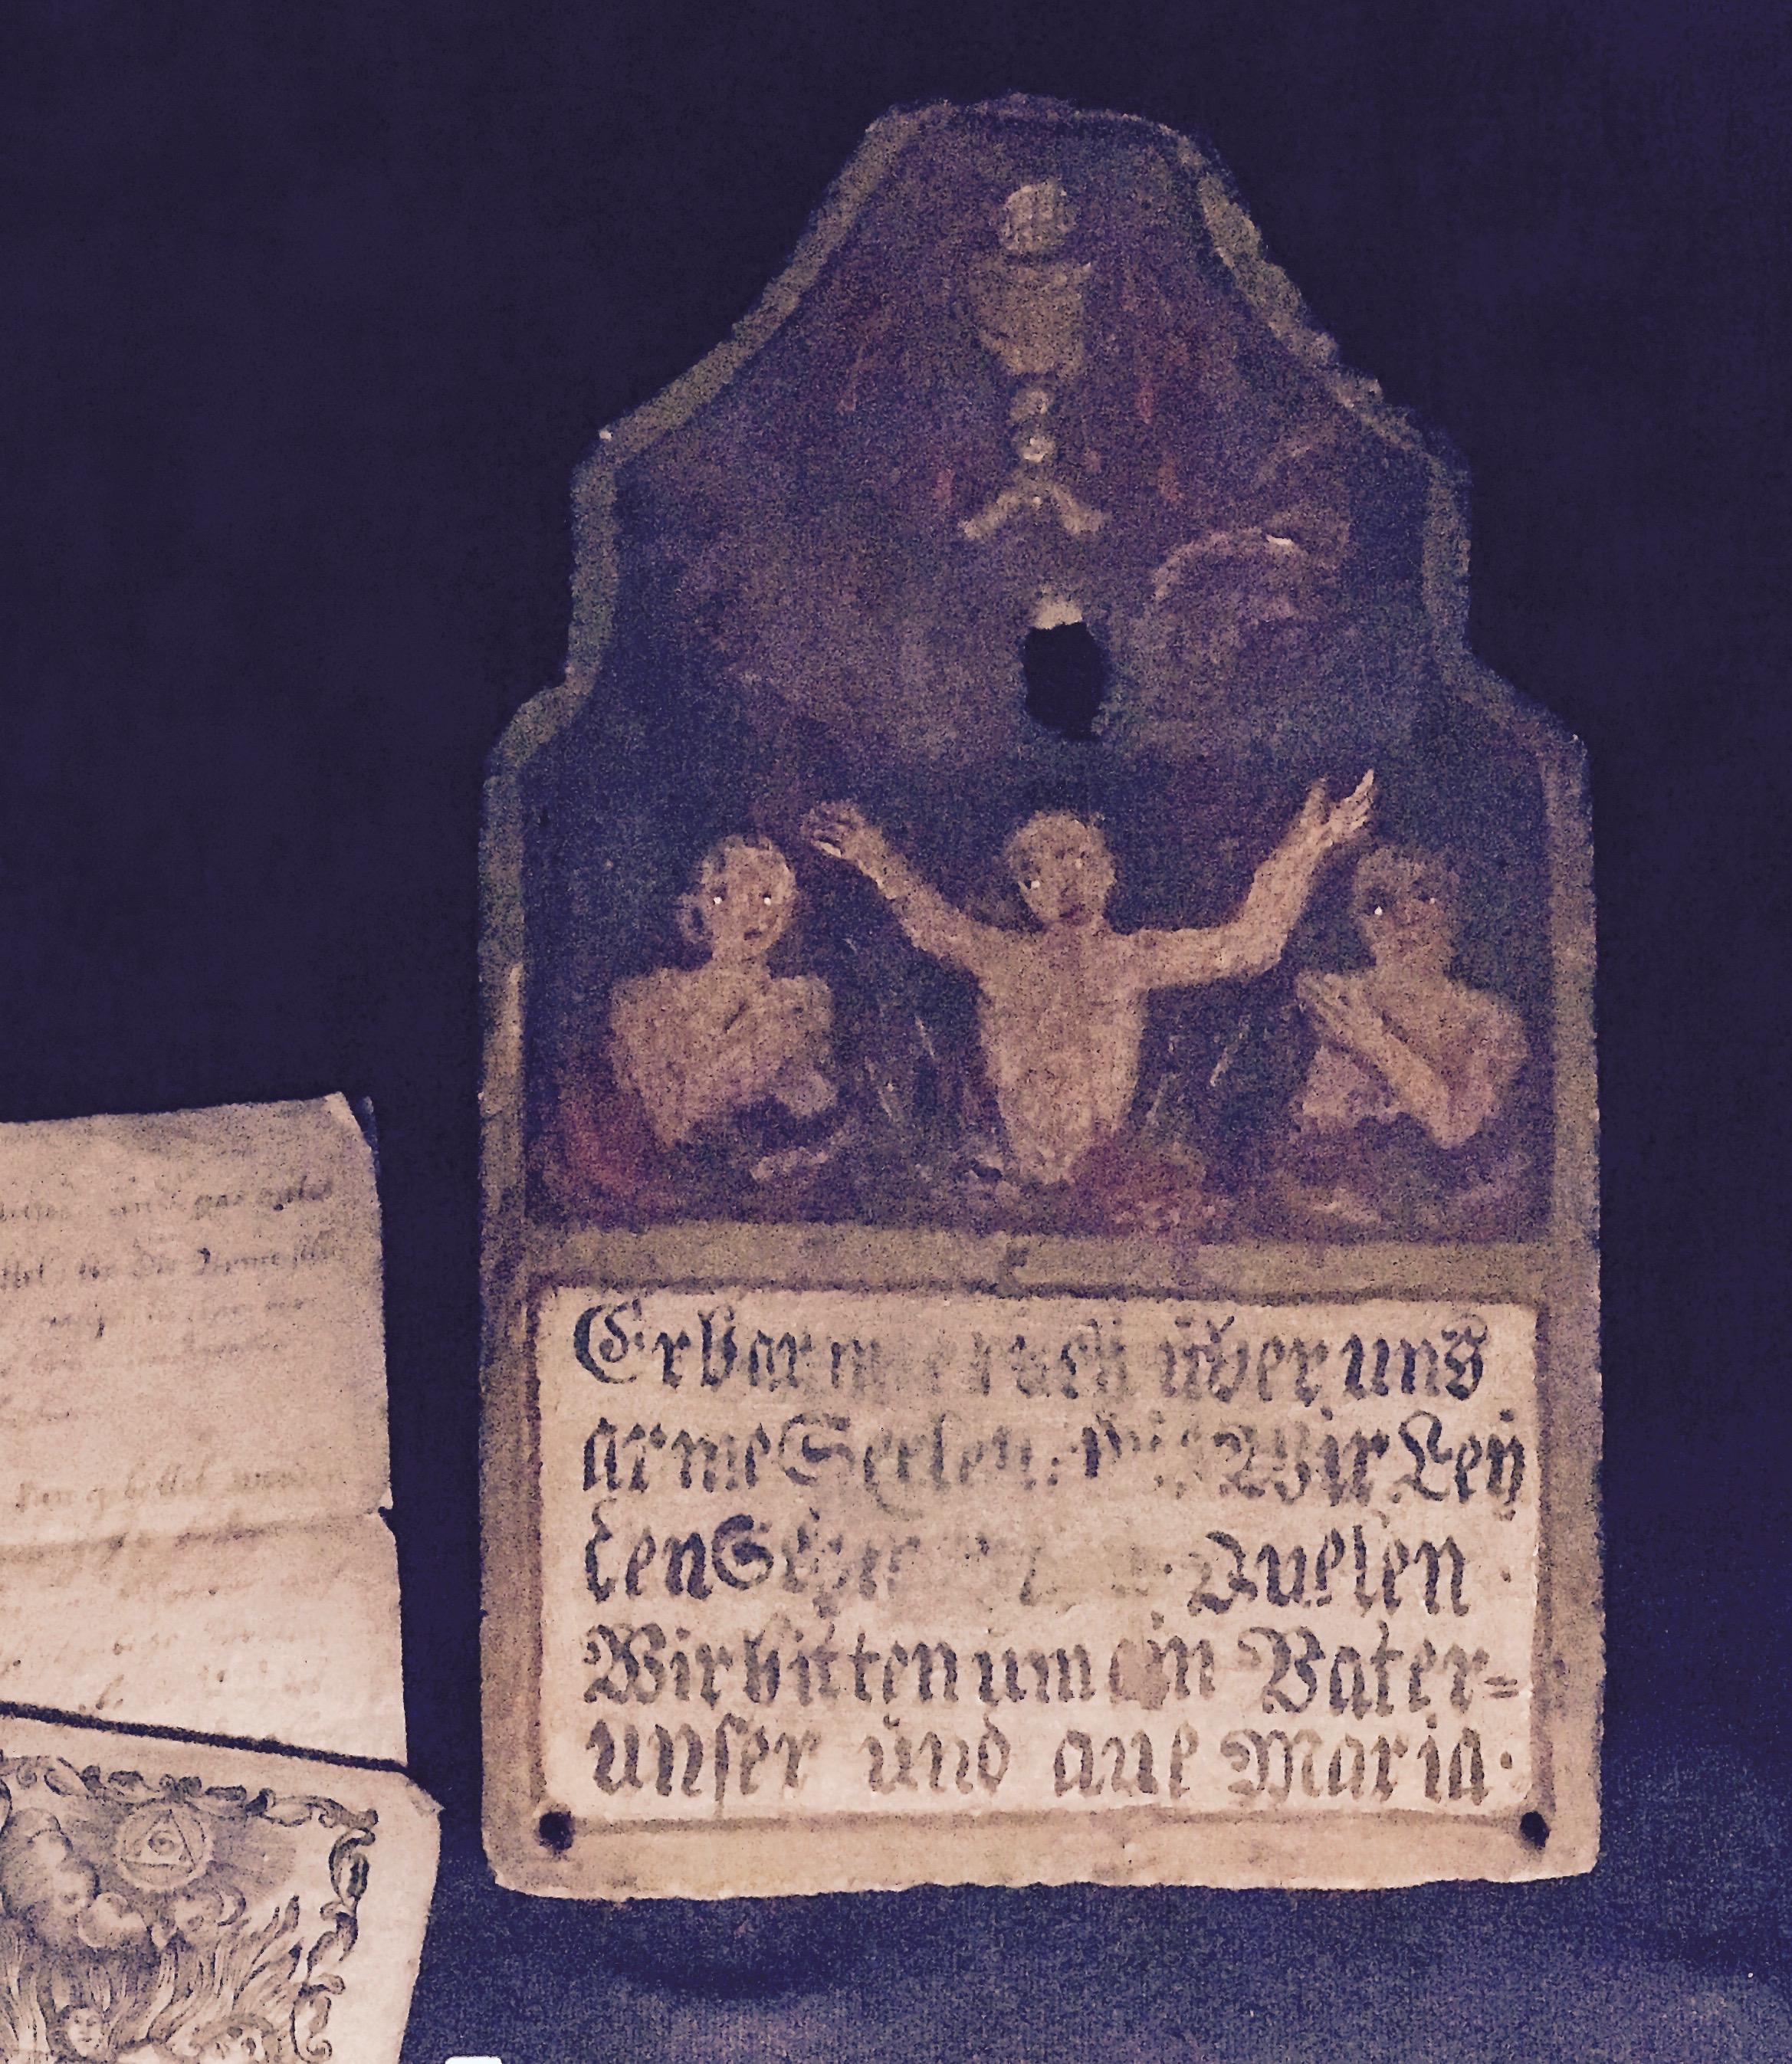 'Armeseelen' altar